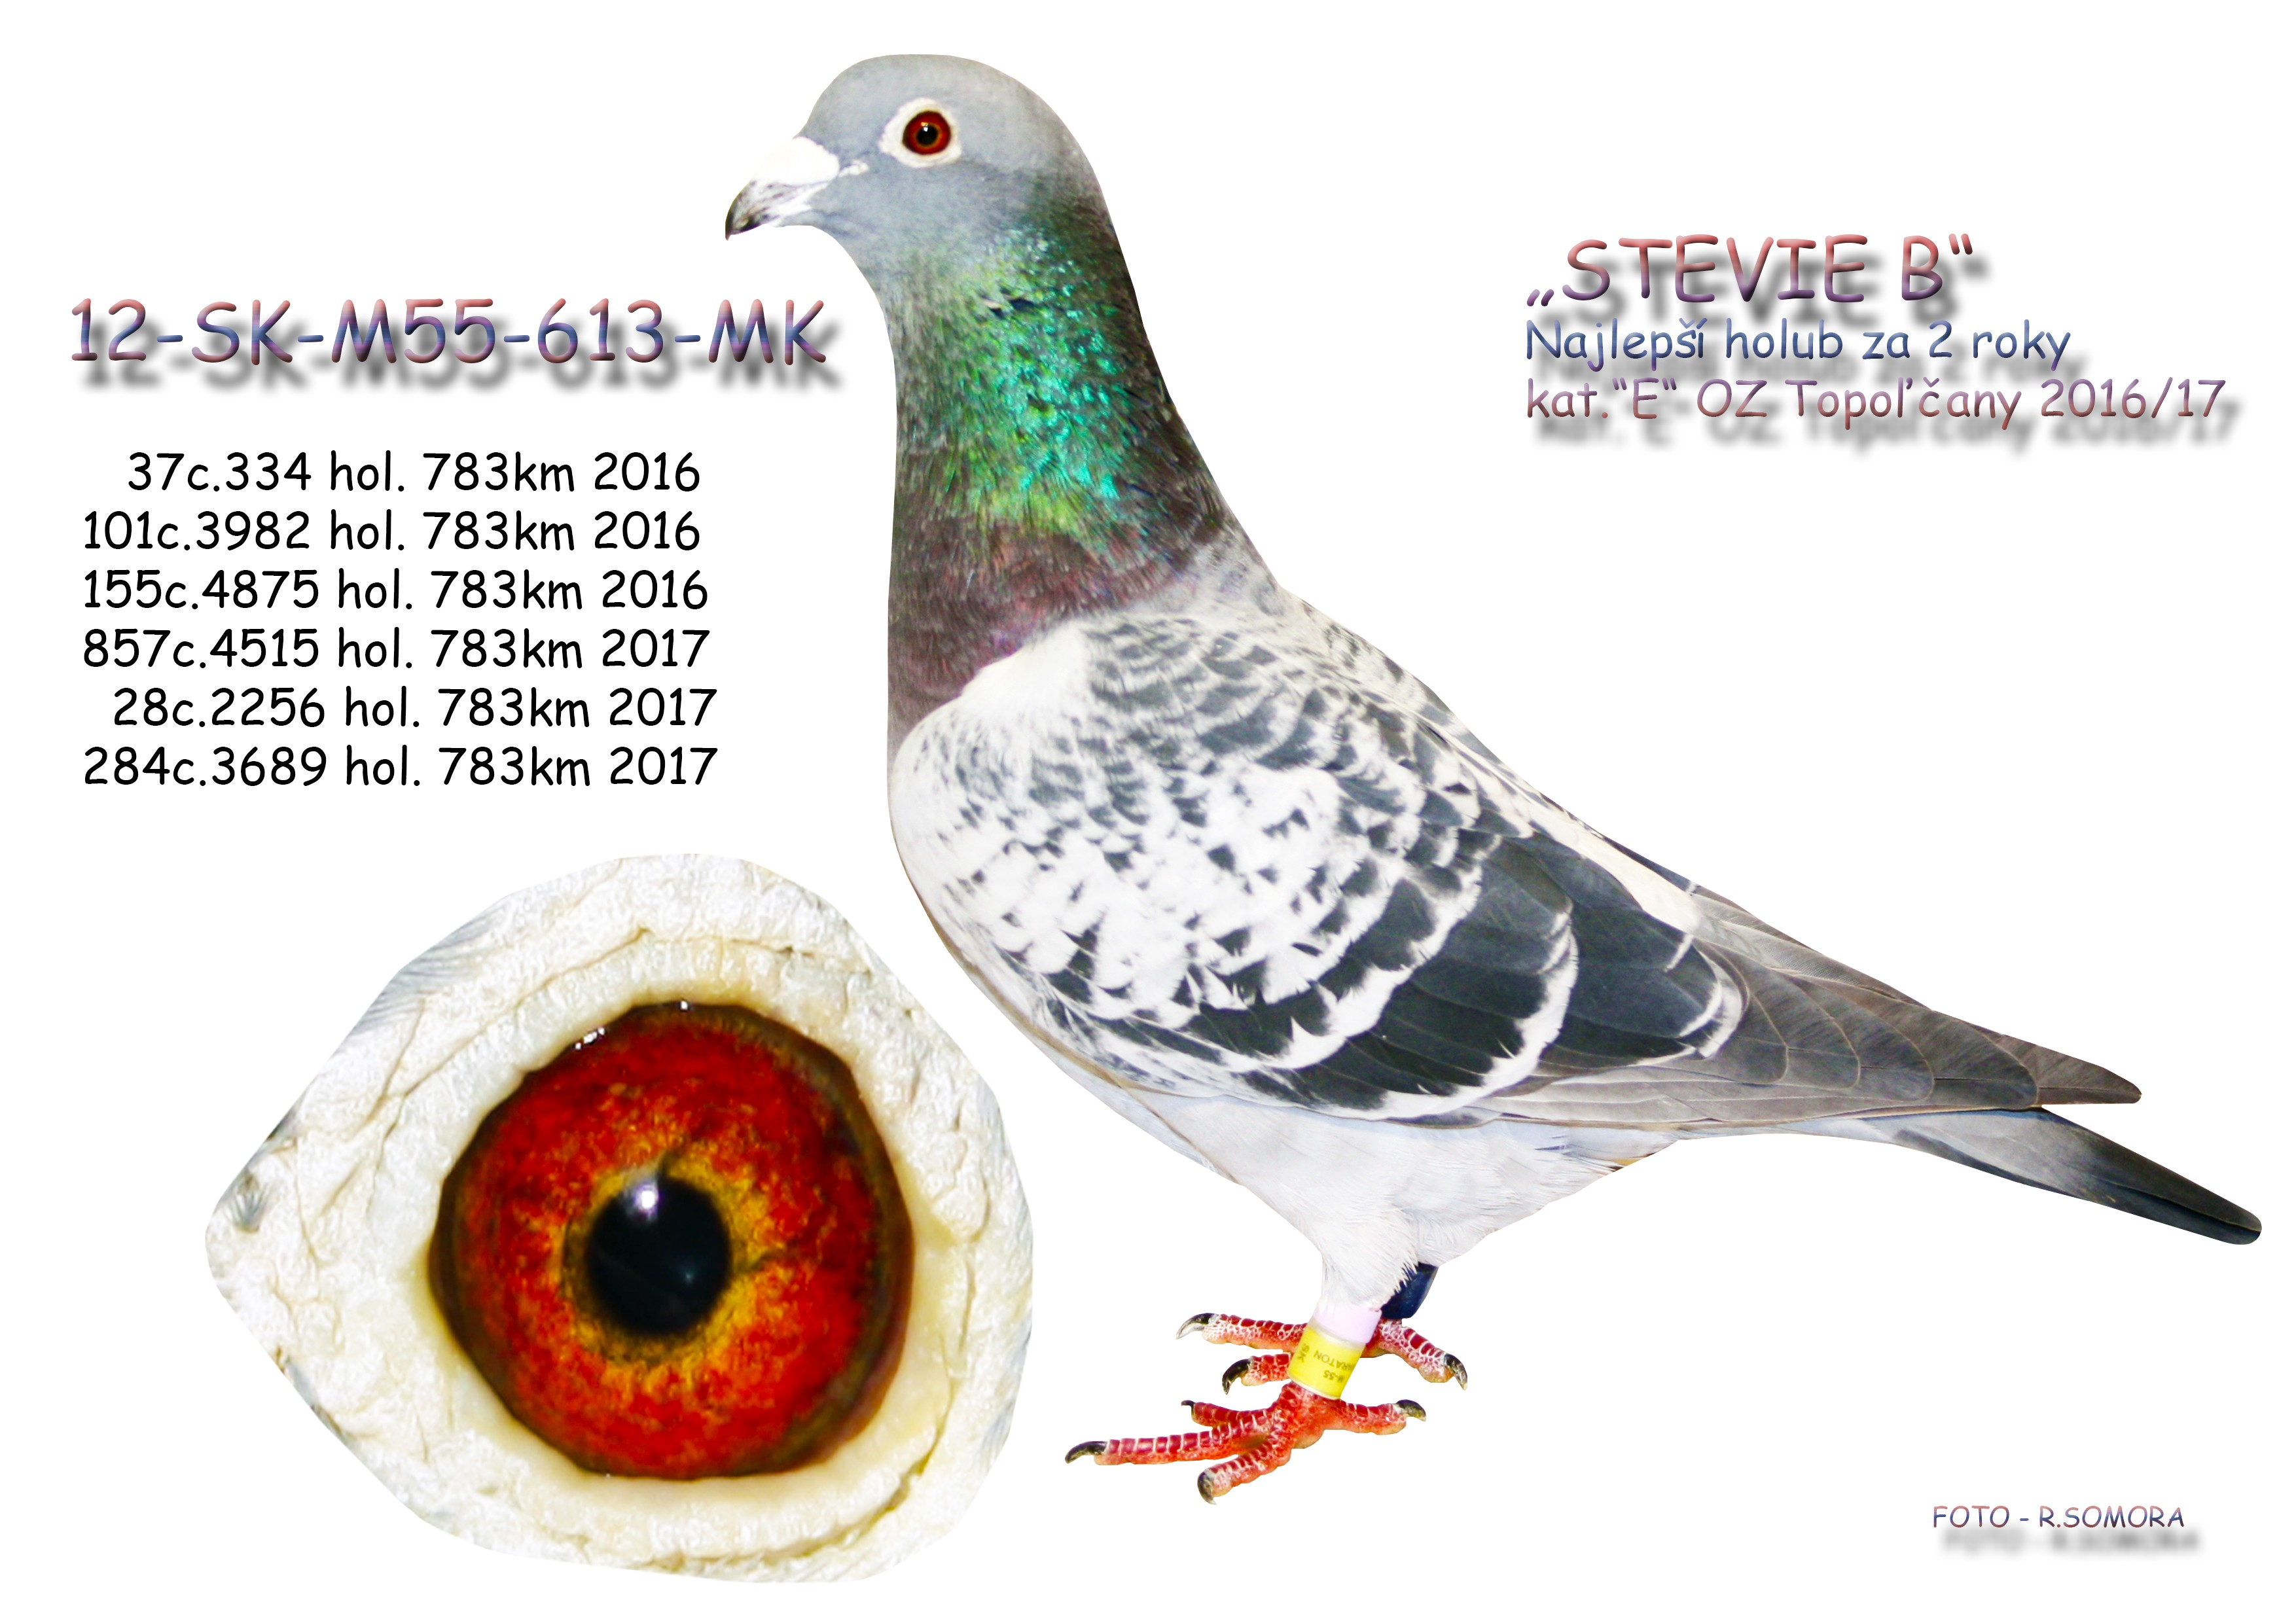 SK-2012-M-55-613 - Somora Jozef+Rudolf